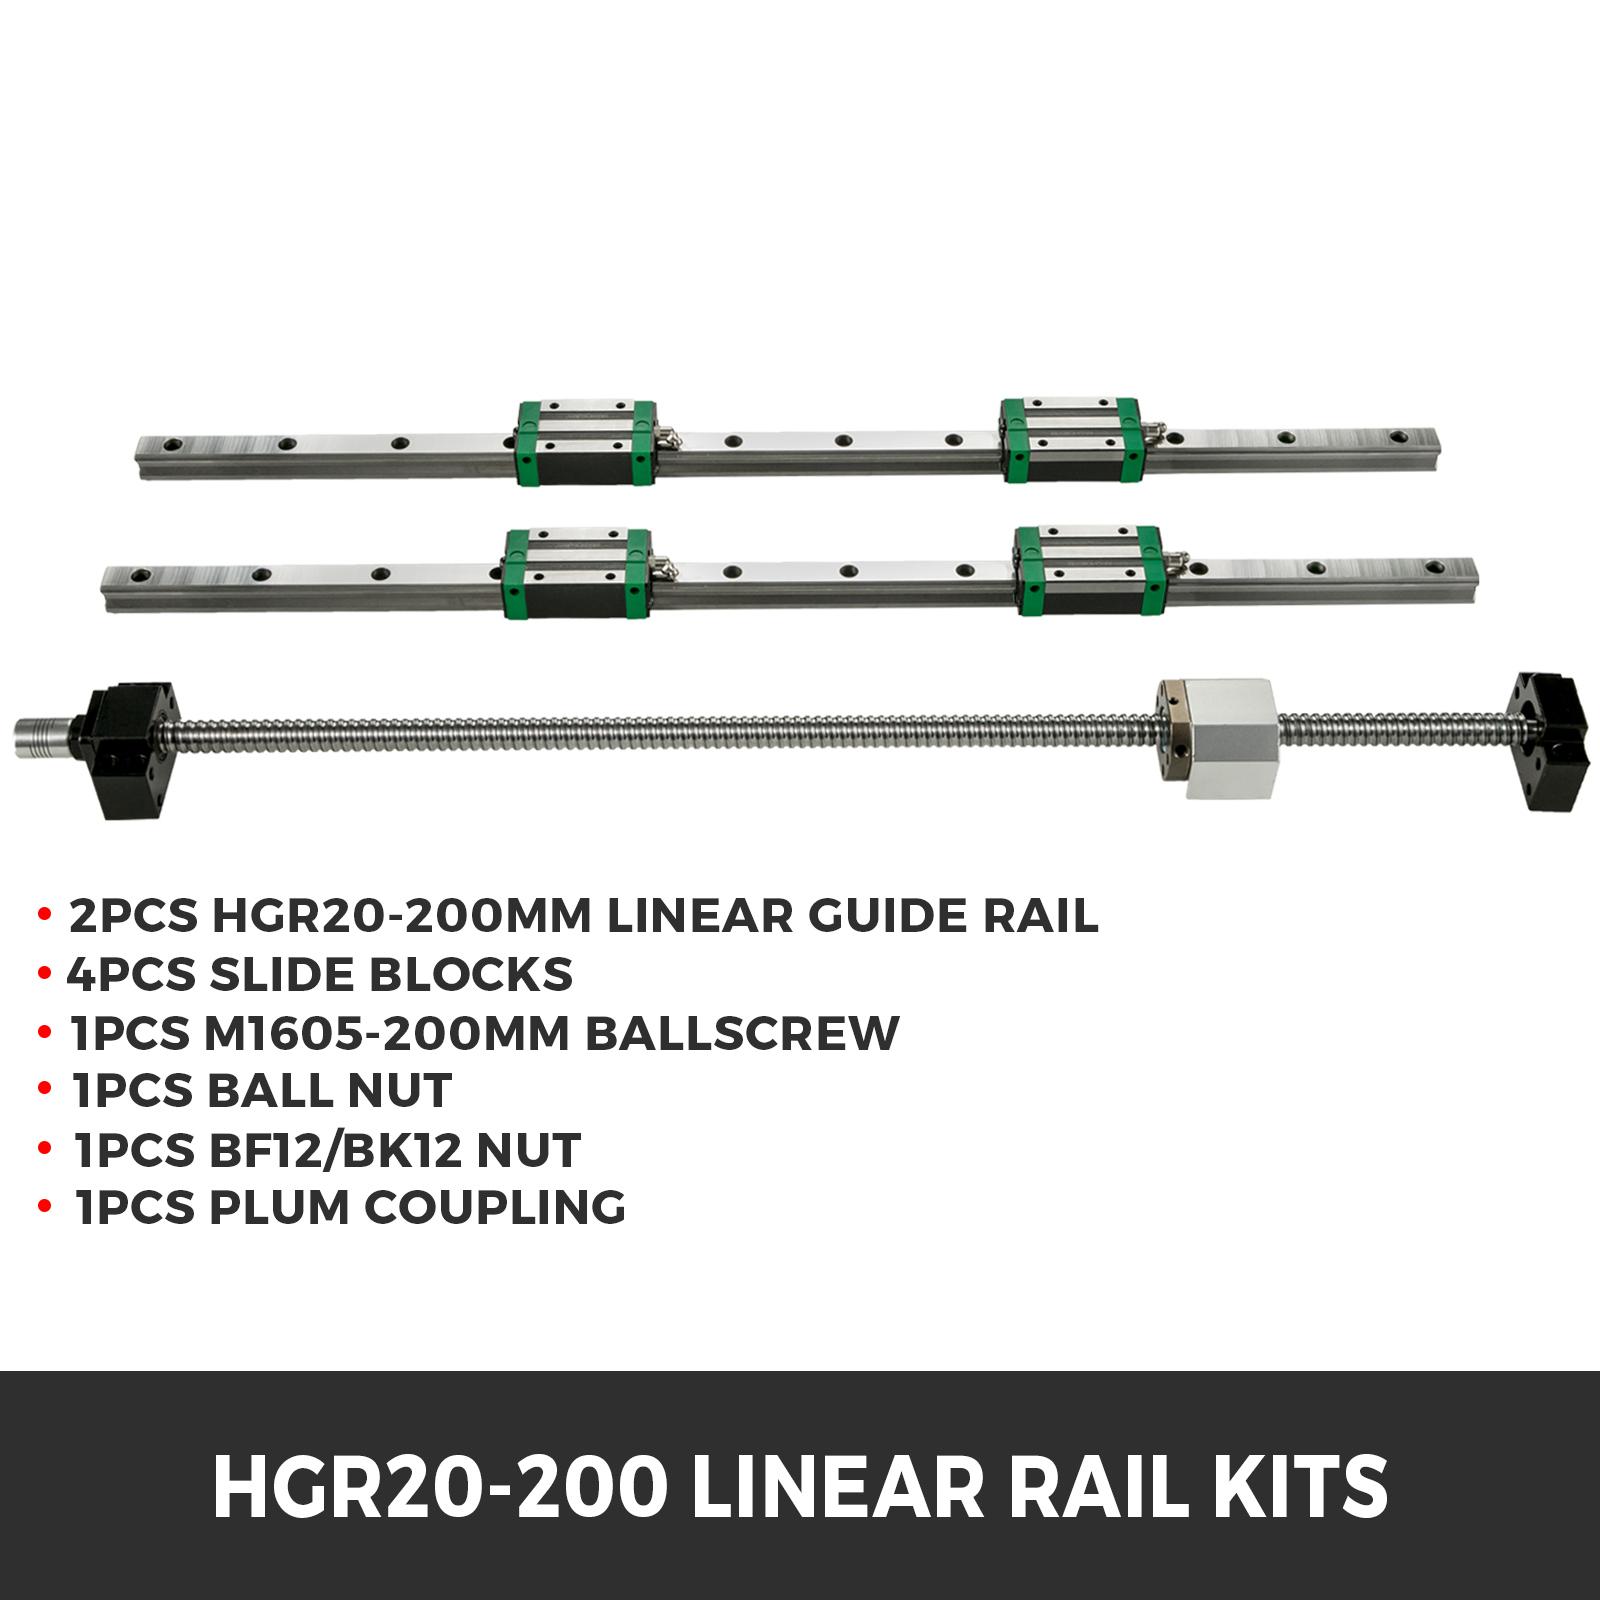 Guida-Lineare-CNC-HGR20-200mm-2-Pezzi-Blocco-di-Cuscinetti-4-Pezzi miniatura 2